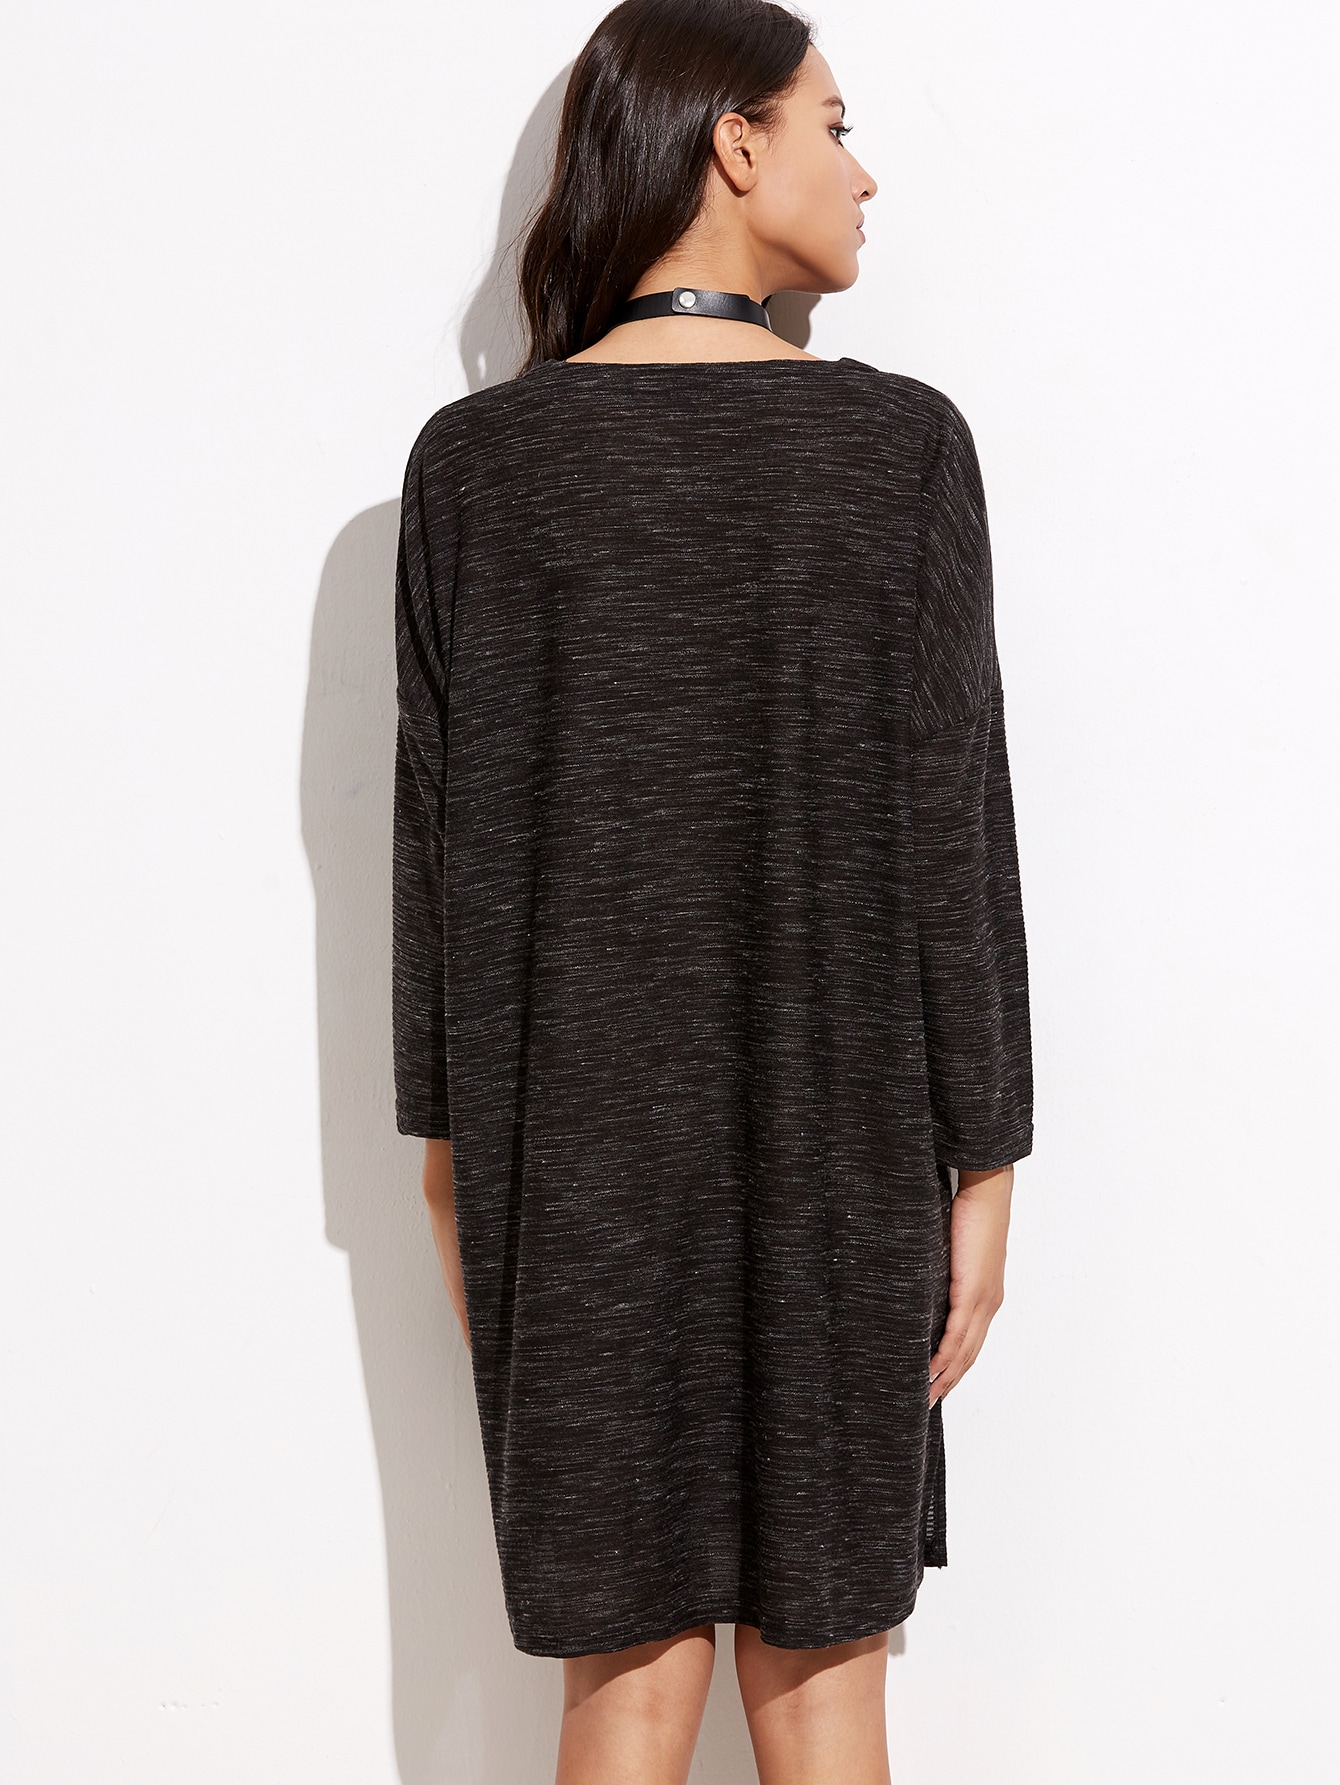 robe t shirt col v manche longue noir french shein sheinside. Black Bedroom Furniture Sets. Home Design Ideas